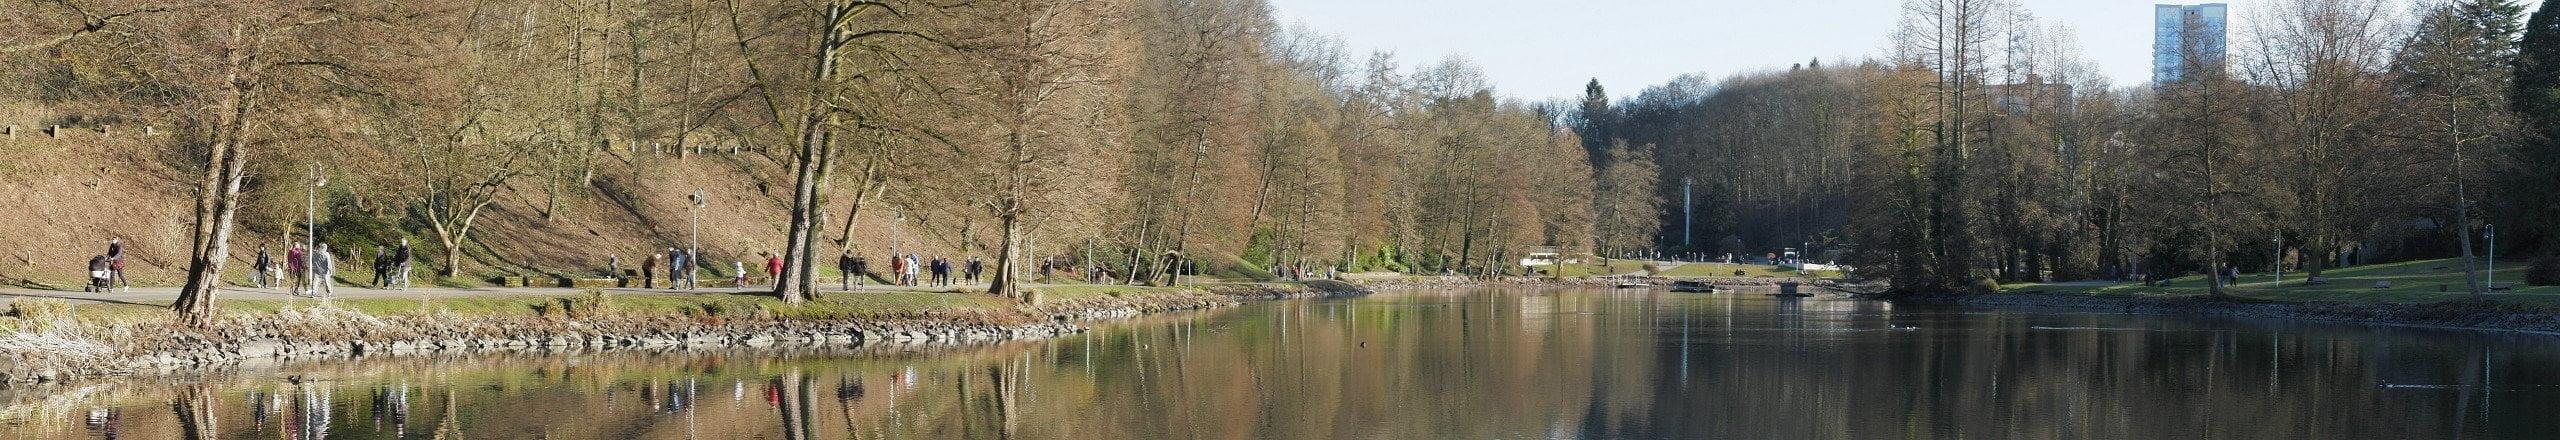 Yi M1 Panoramaaufnahme